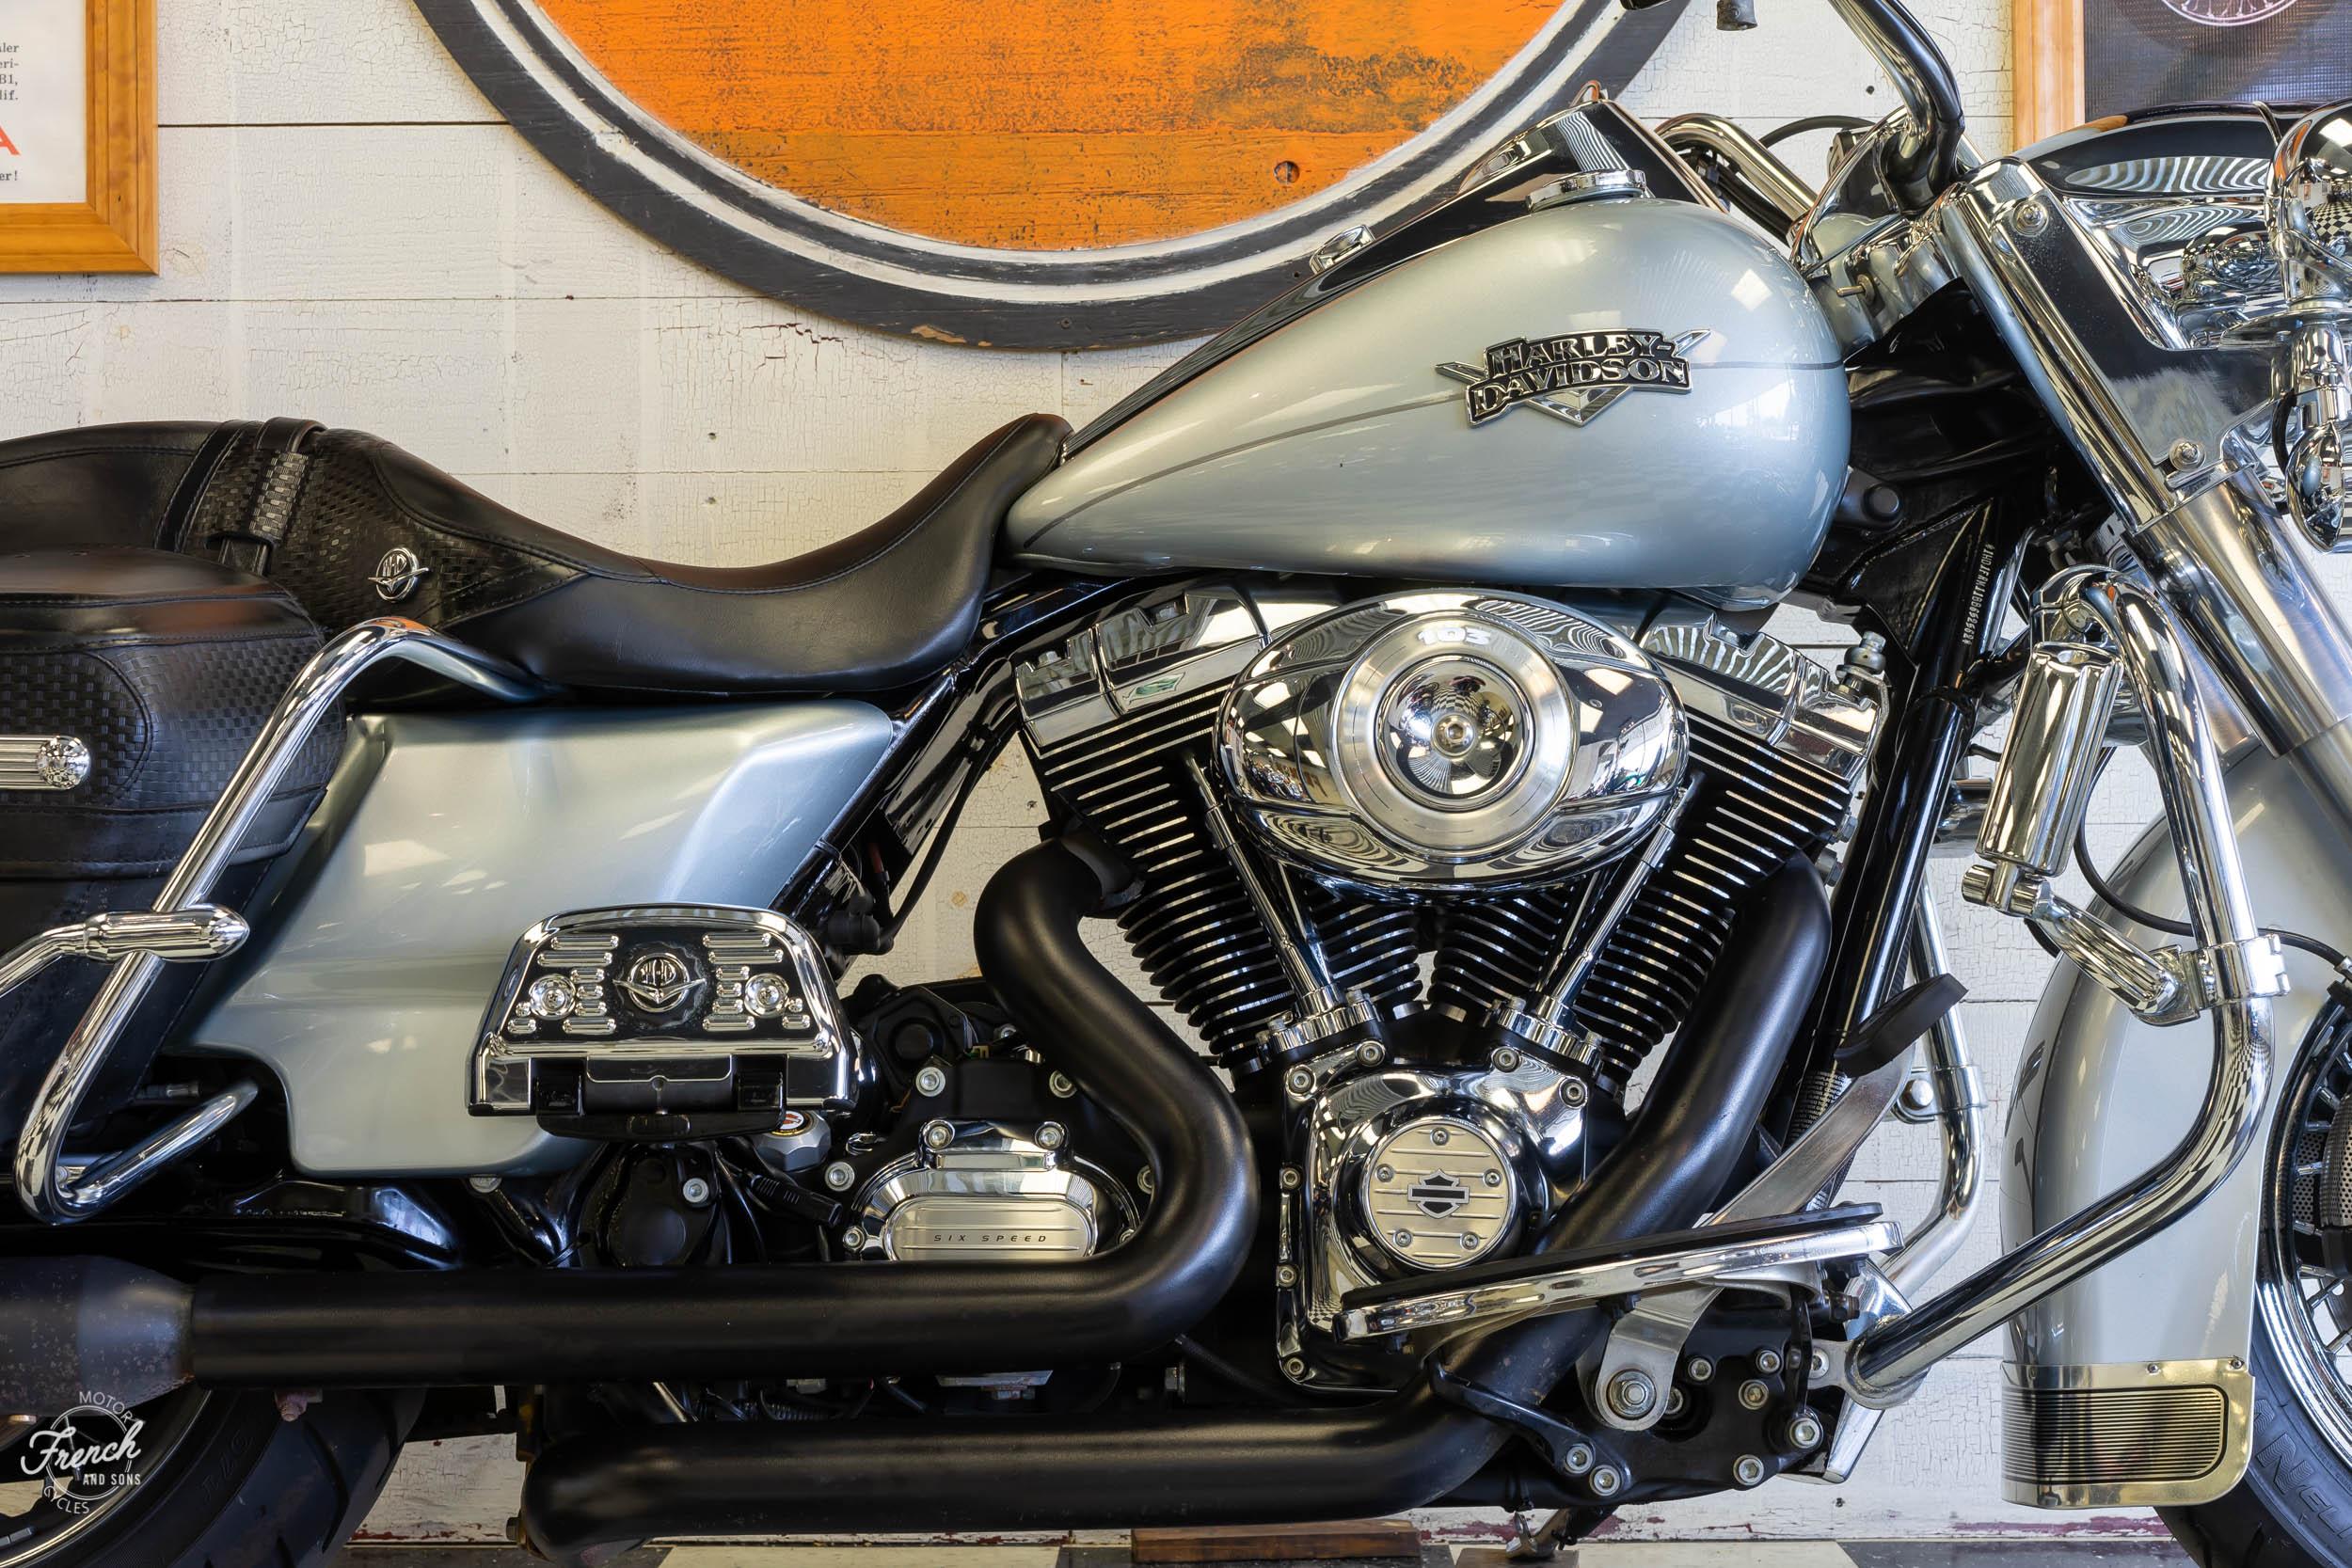 2011_Harley_davidson_road_king_silver-4.jpg